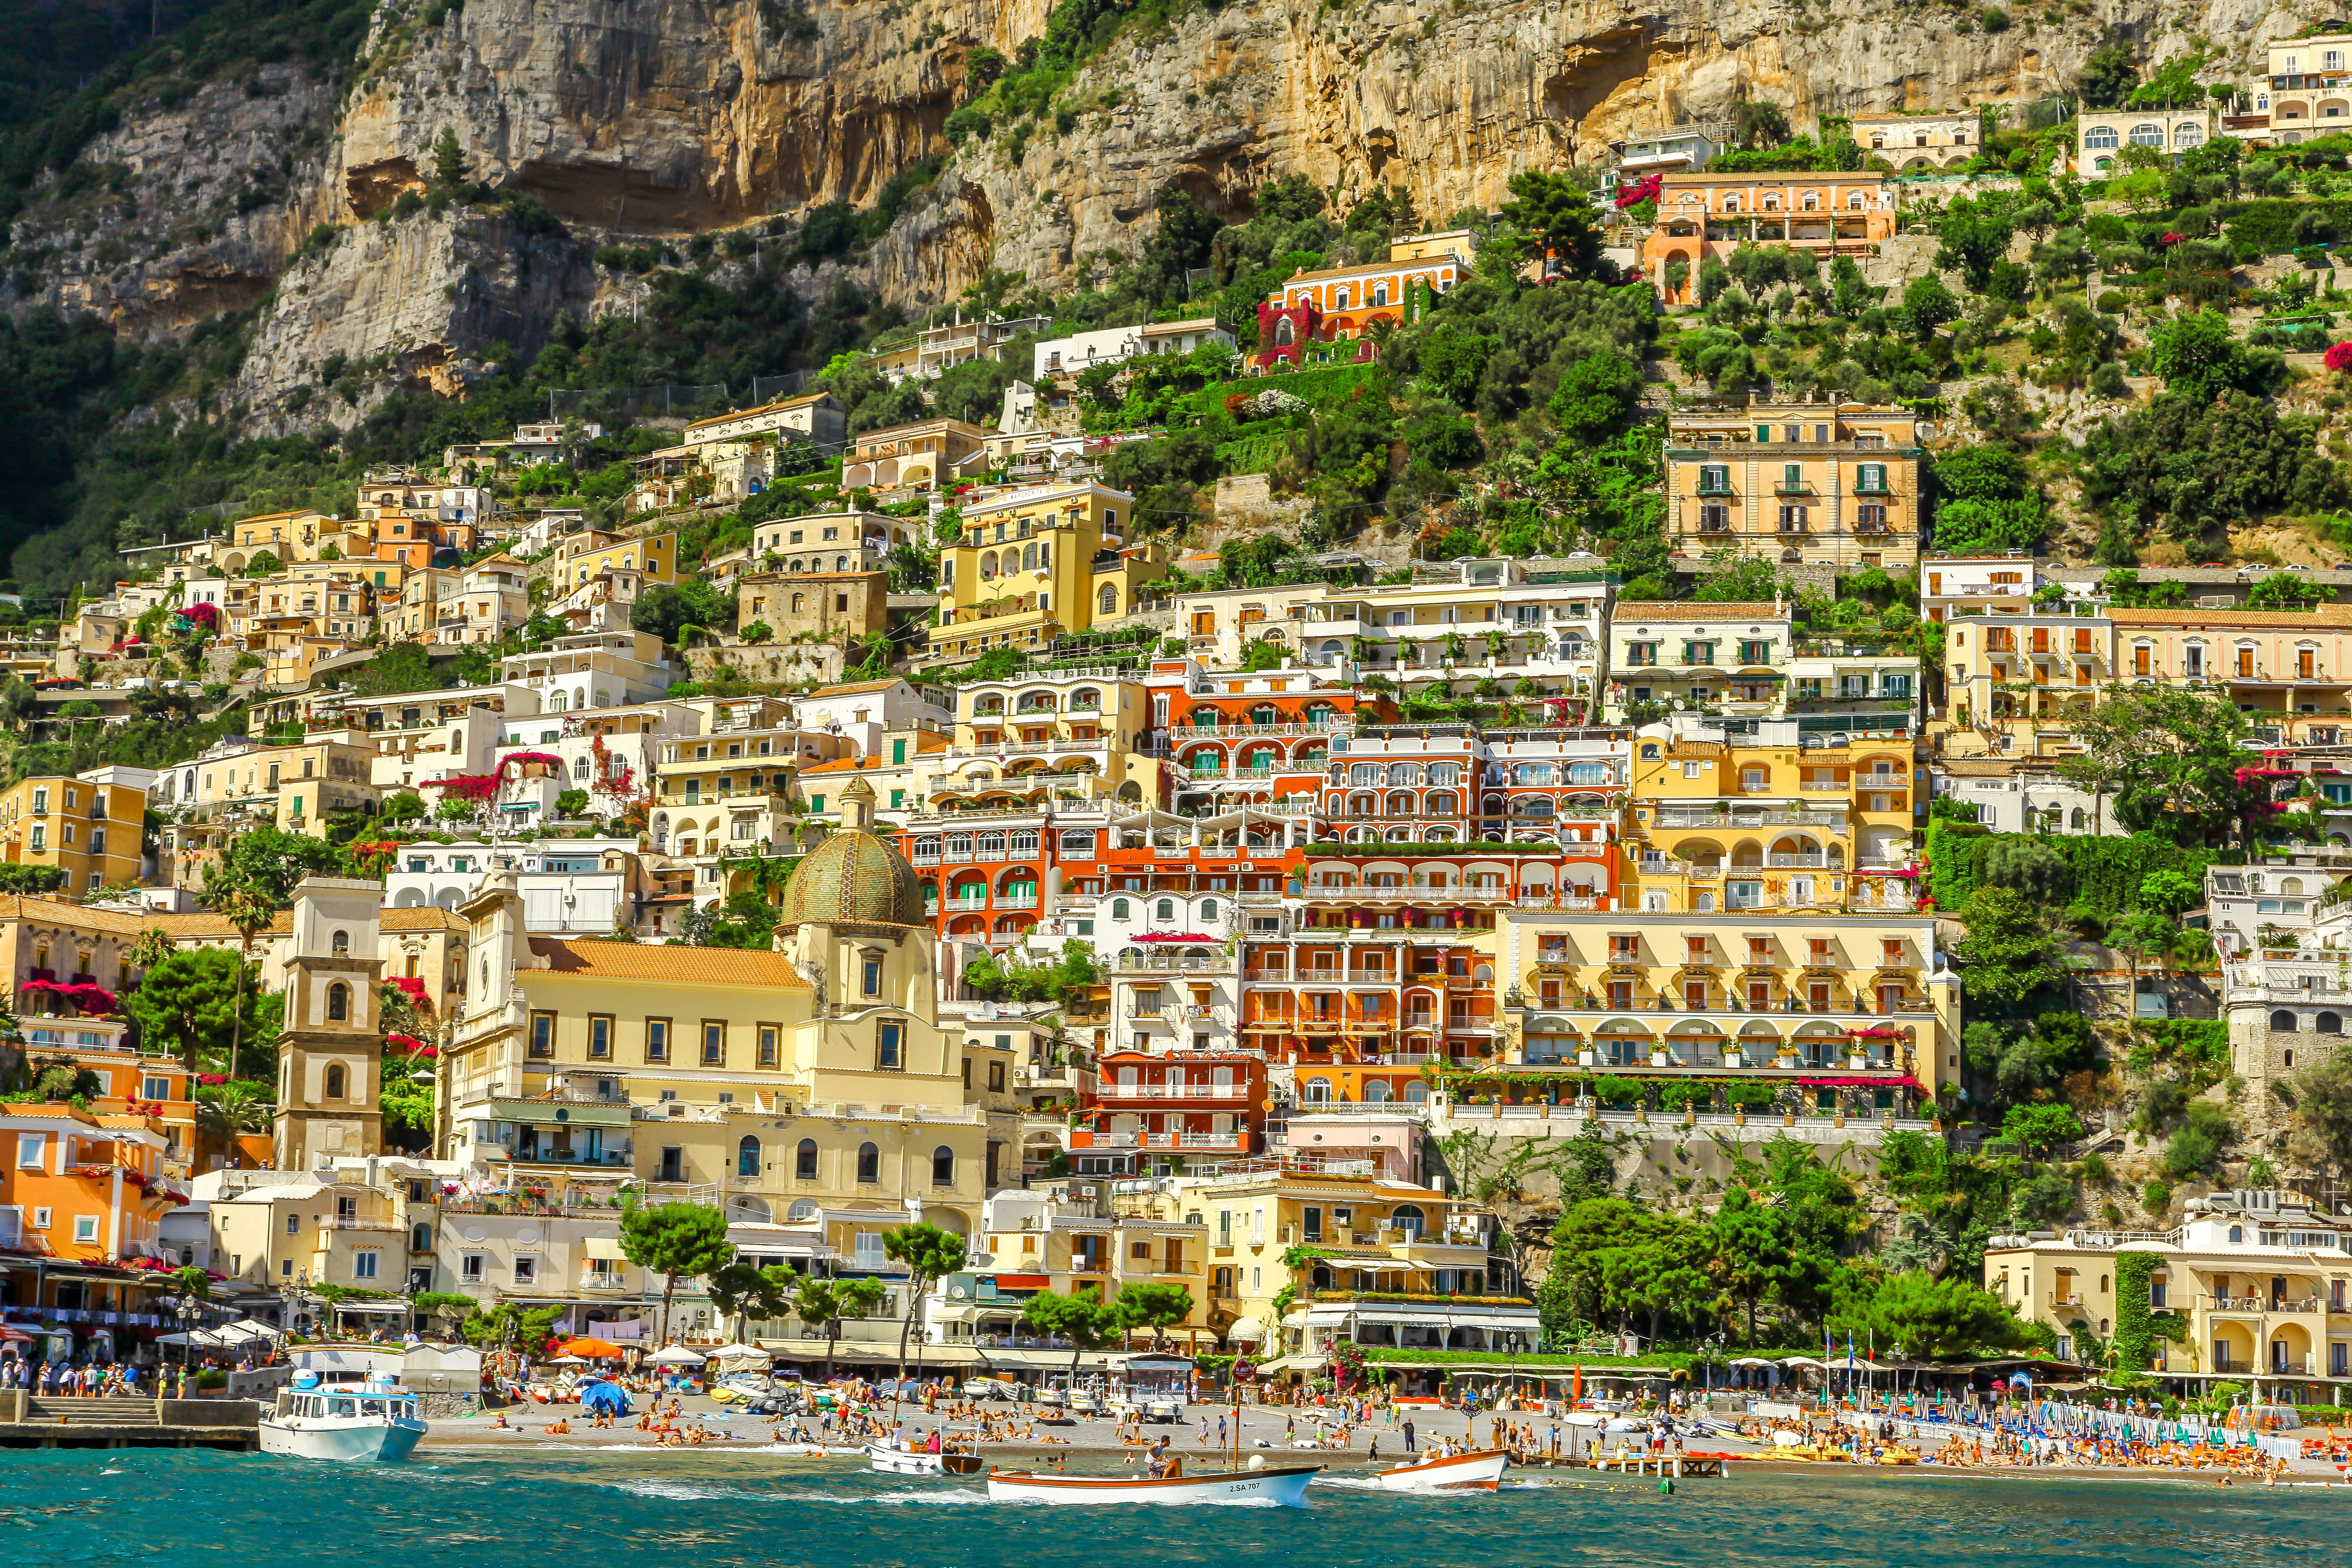 The Most Splurge-Worthy Honeymoon Destinations